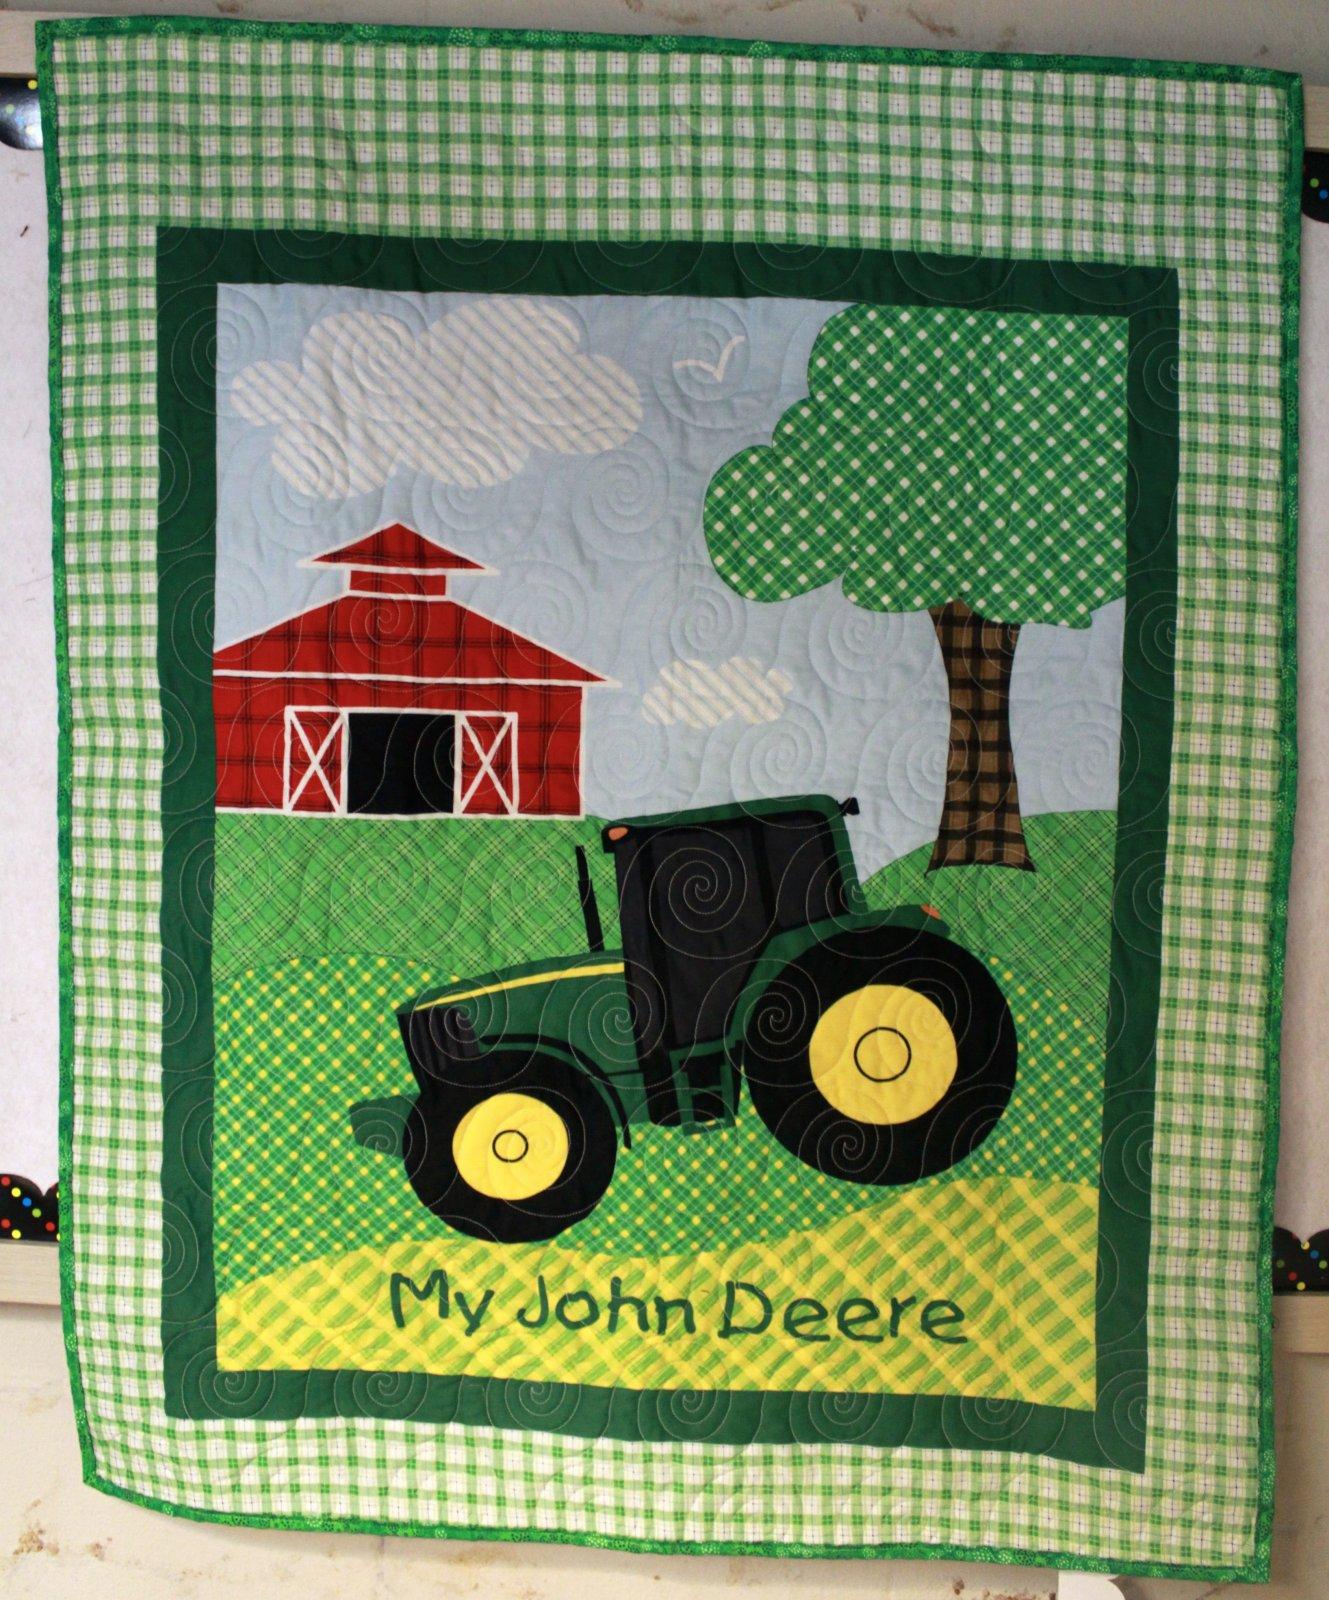 John Deere Tractor Quilt Crib/Lap/Wall : john deere quilts - Adamdwight.com